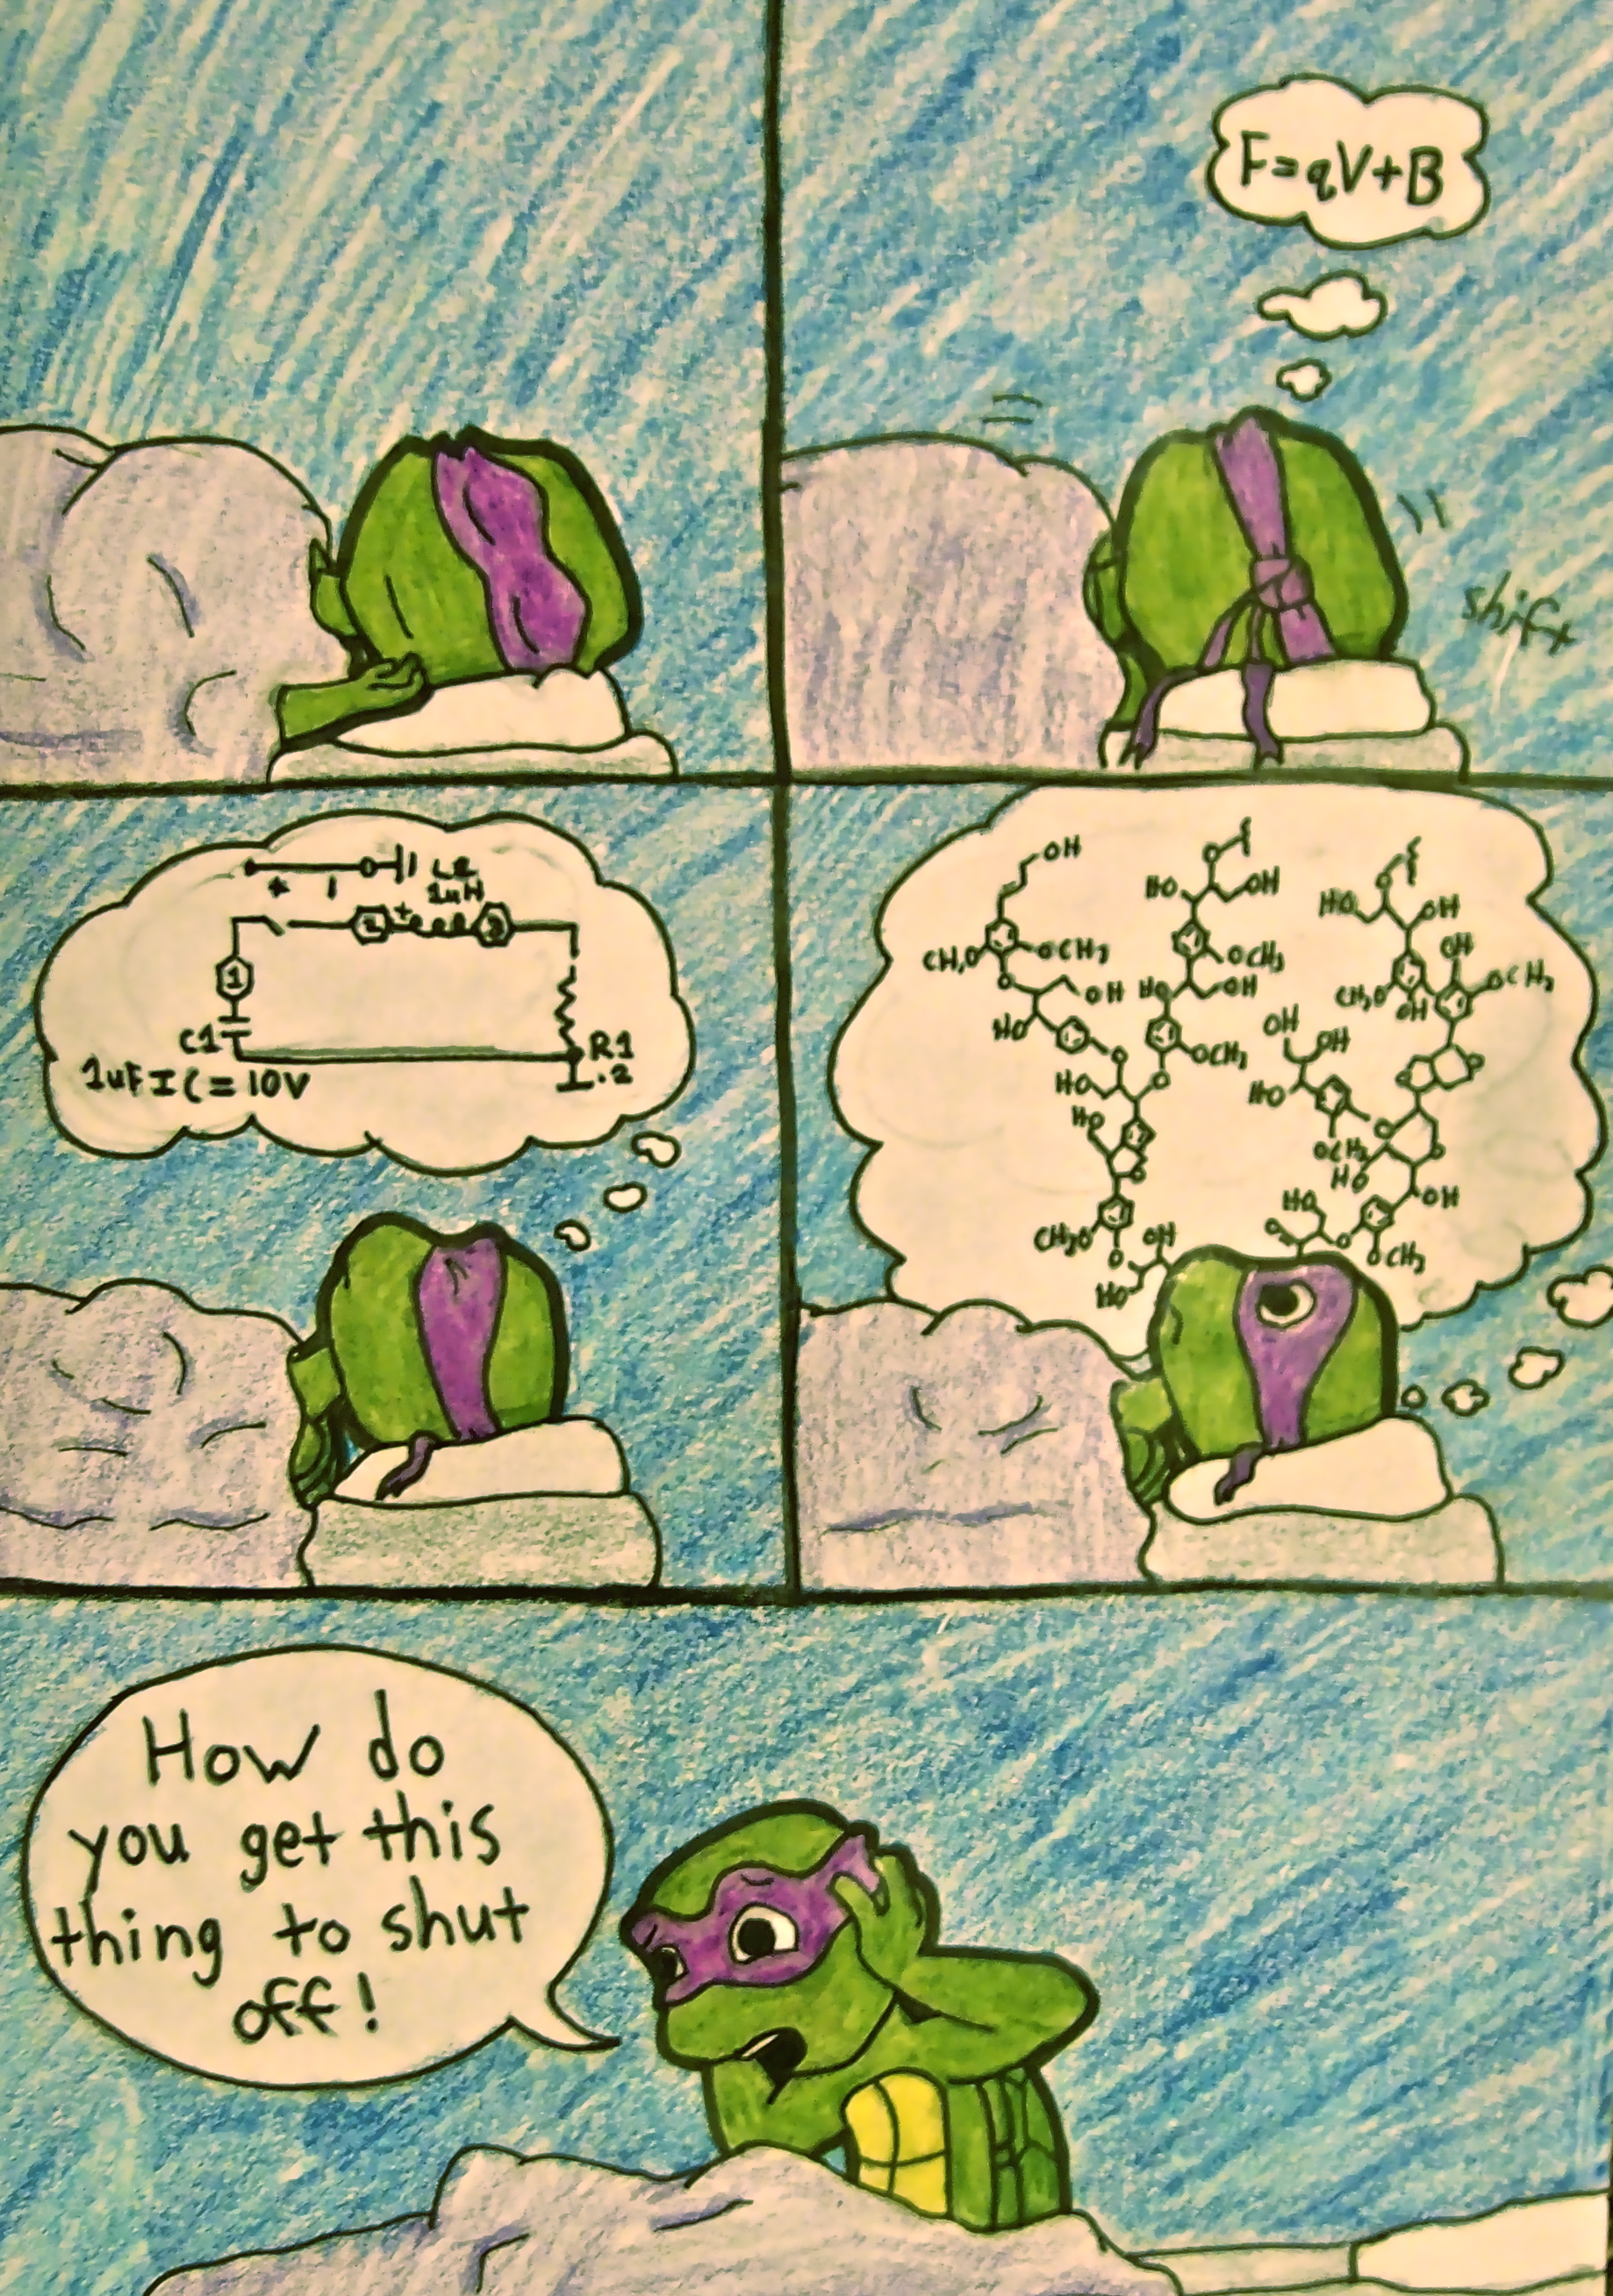 Donatello Splinter images Too Much Brain Power HD ...